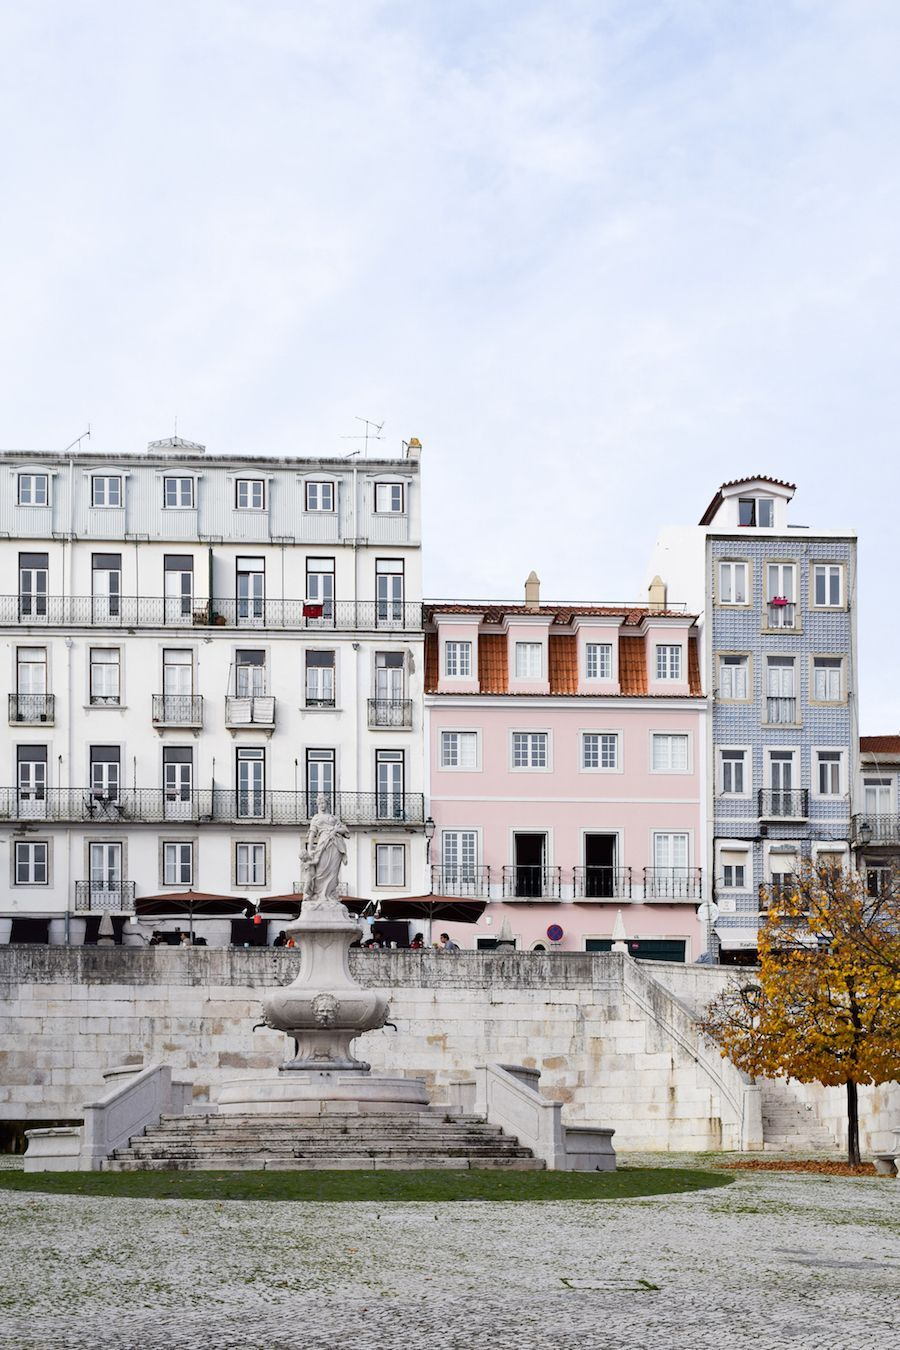 Chafariz das Janelas Verdes, Lisbon, Portugal